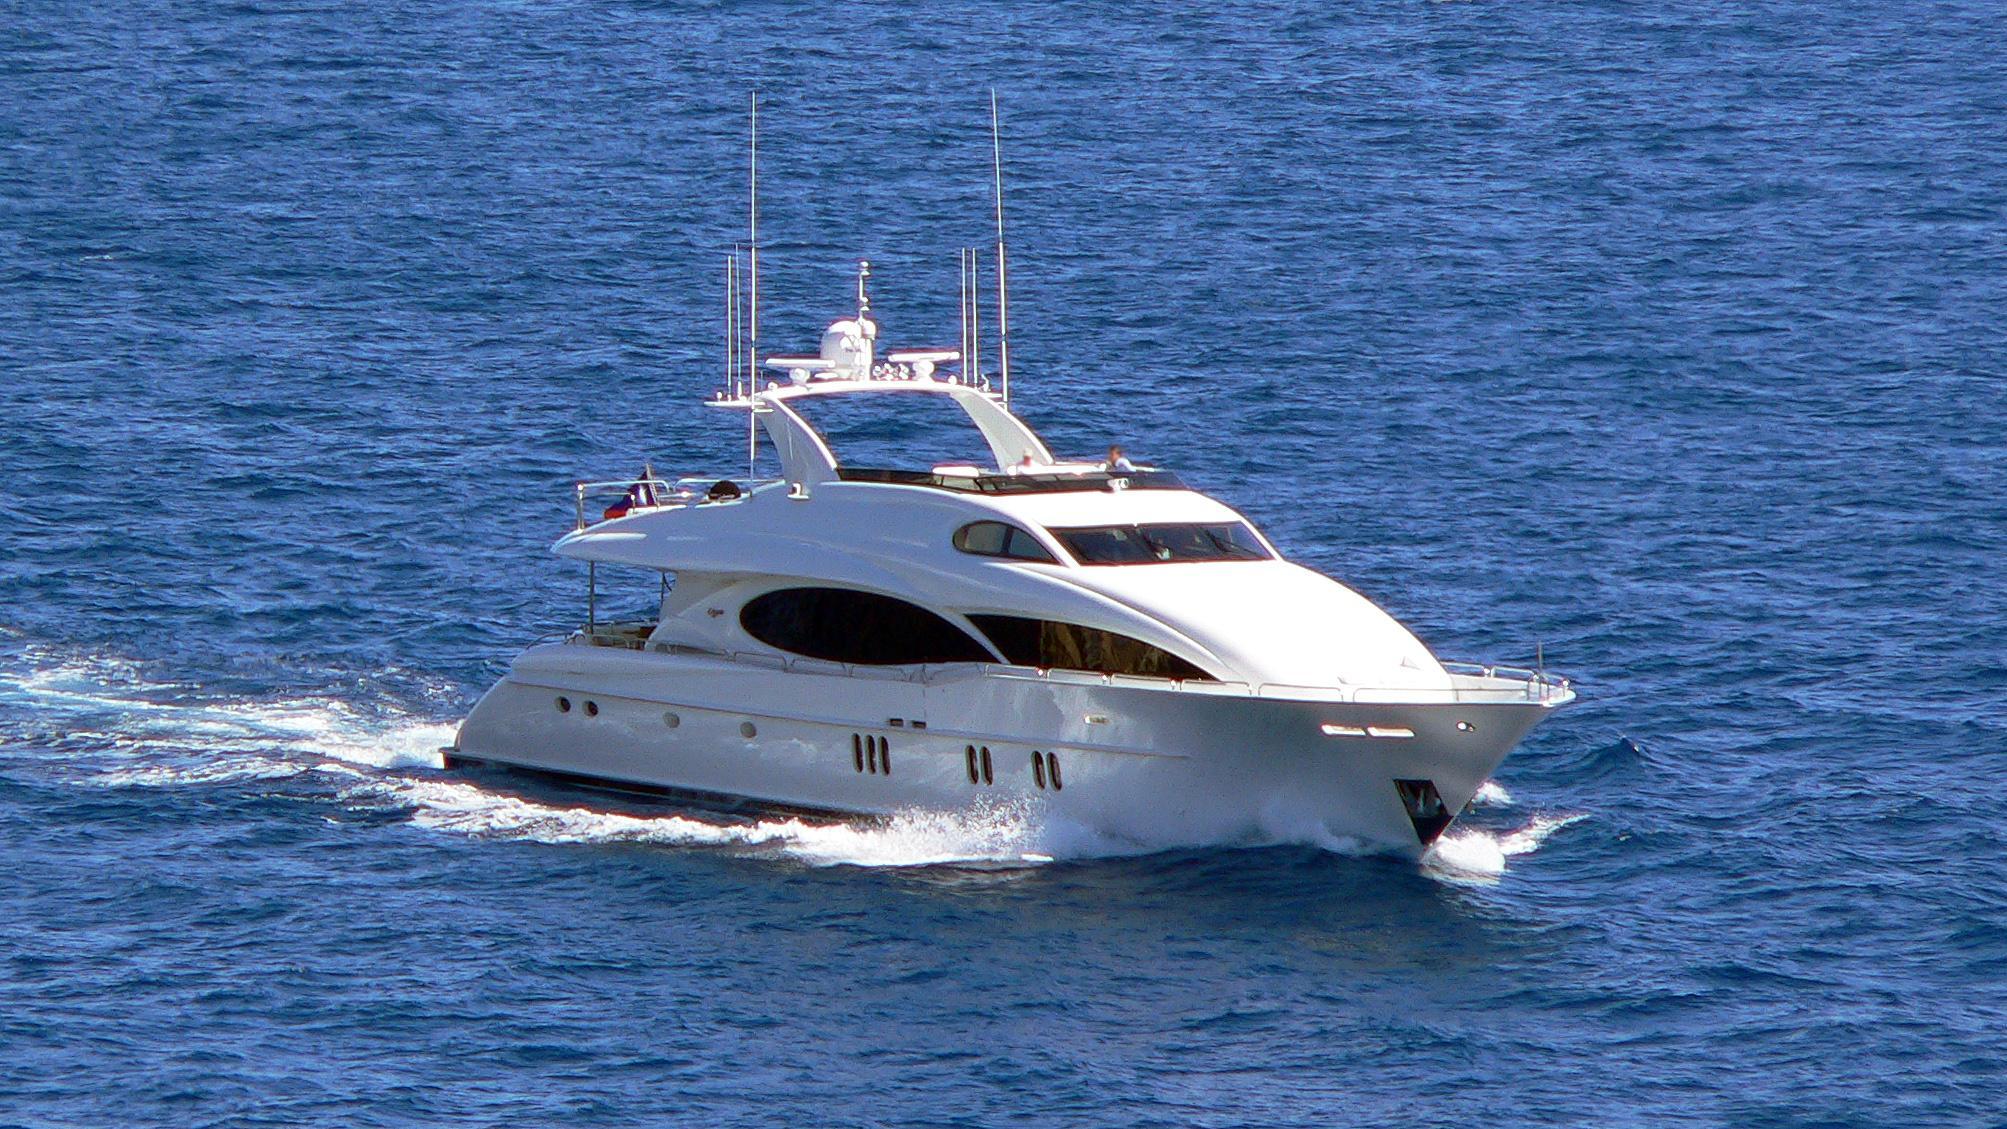 le-reve-motor-yacht-lazzara-110-sl-2006-33m-cruising-half-profile